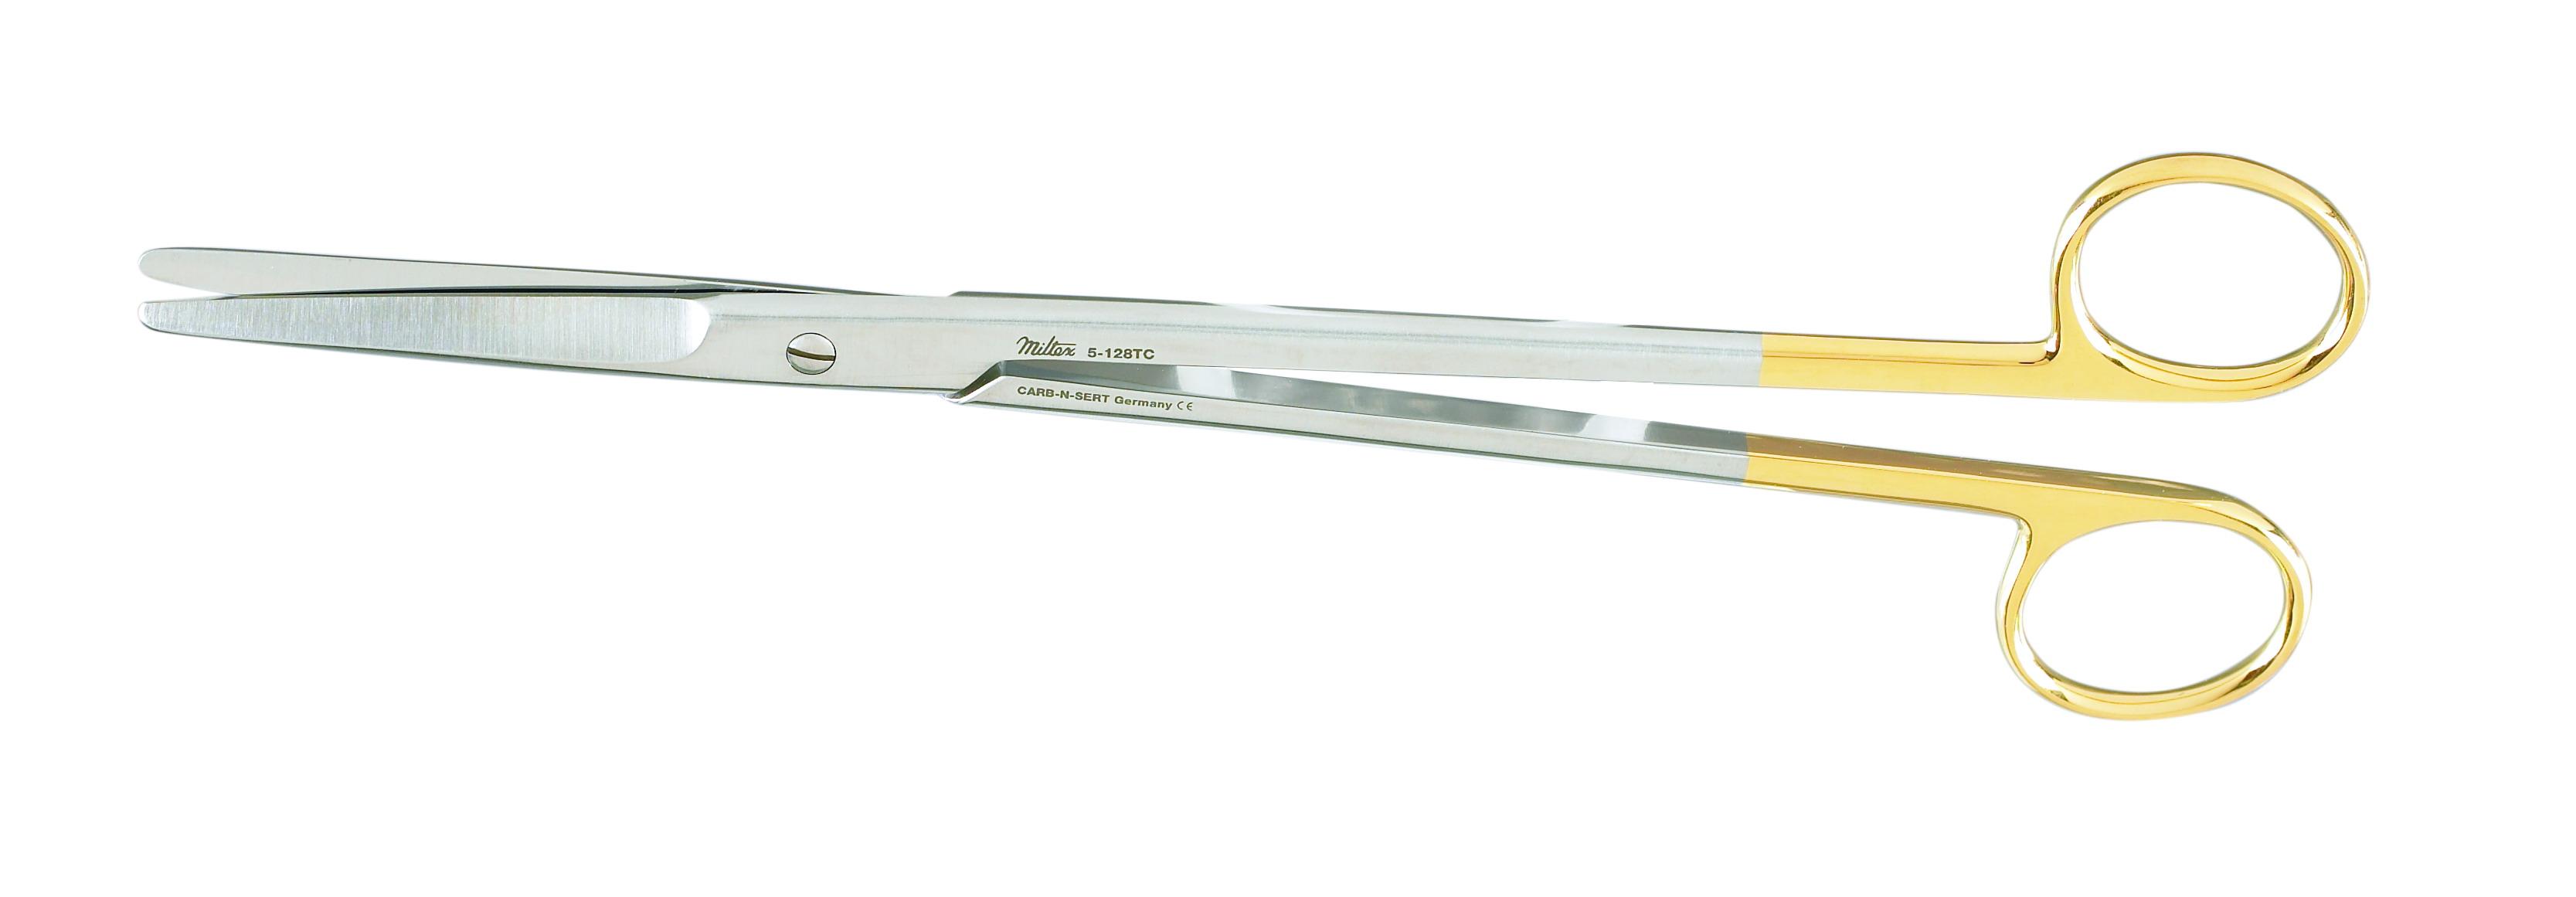 mayo-dissecting-scissors-9-229-cm-straight-standard-beveed-blades-5-128tc-miltex.jpg